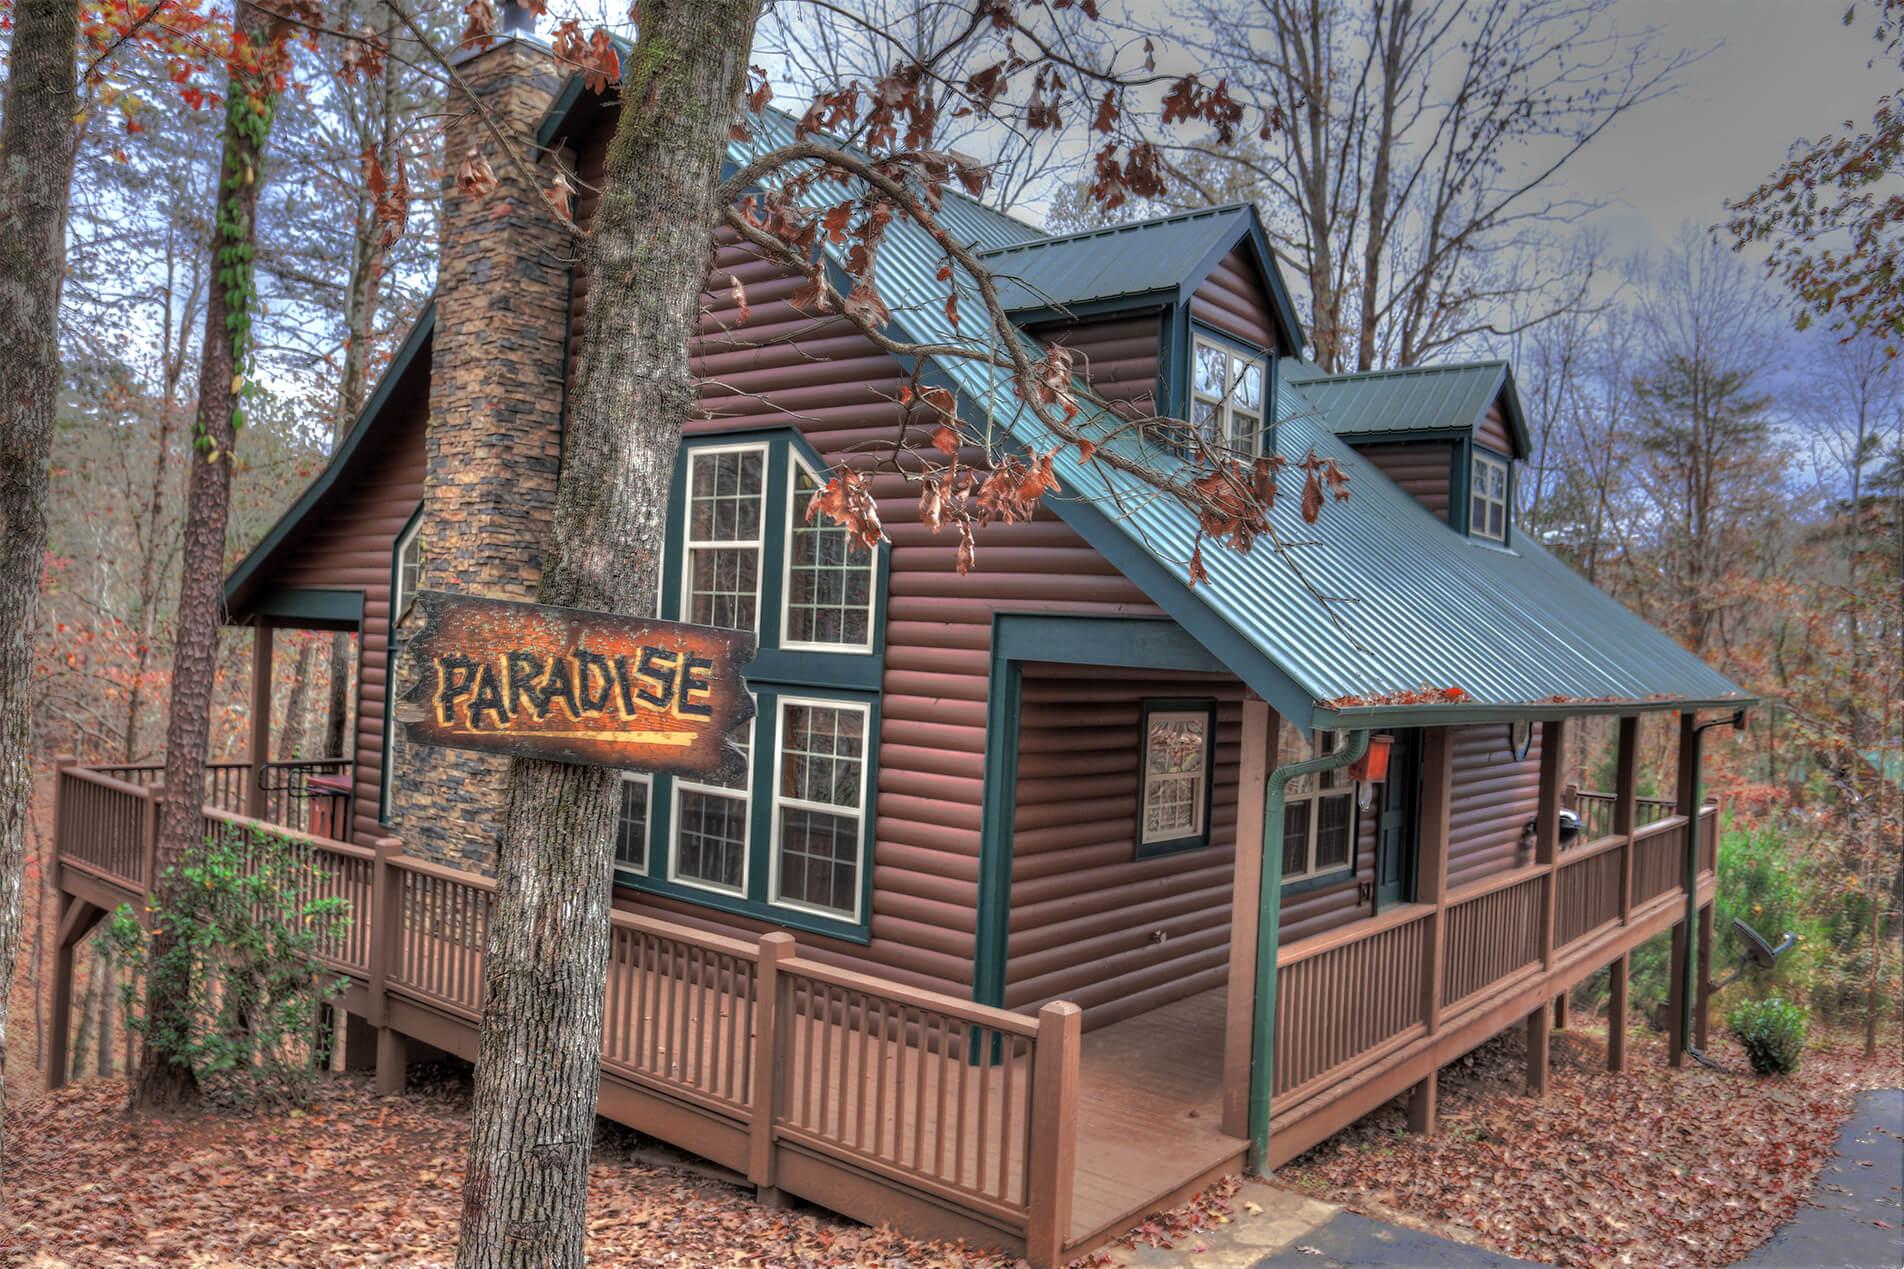 Paradise-Cedar-Creek-Cabin-Rentals-Helen-Georgia-top-banner-1